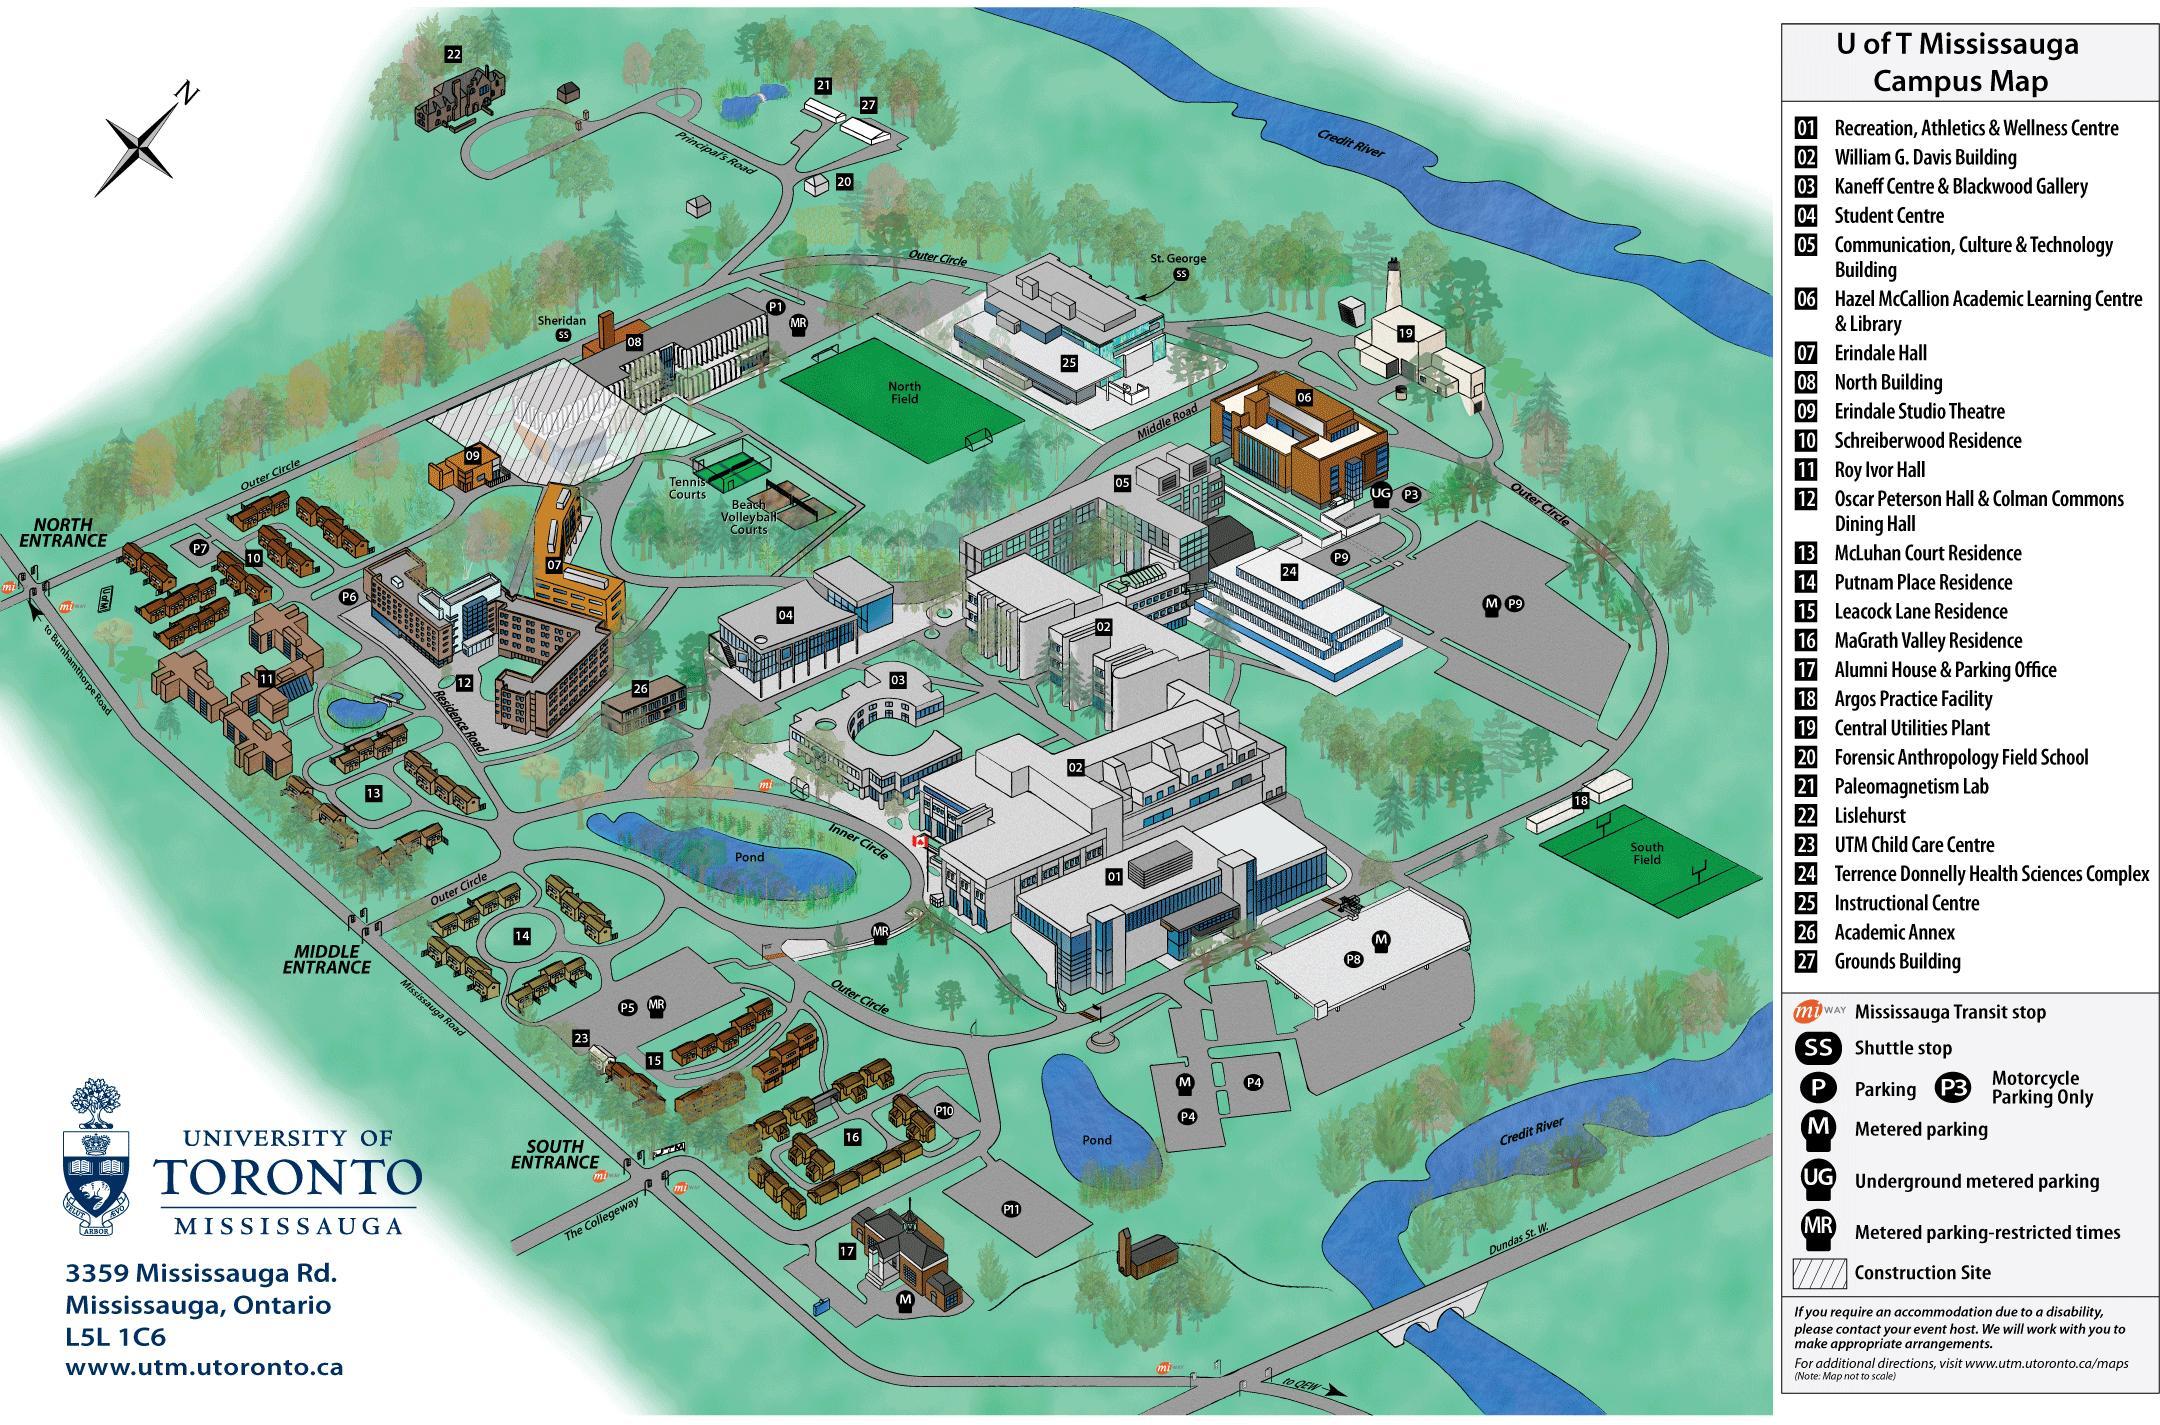 U Of T Campus Map University Of Toronto Campus Map Canada